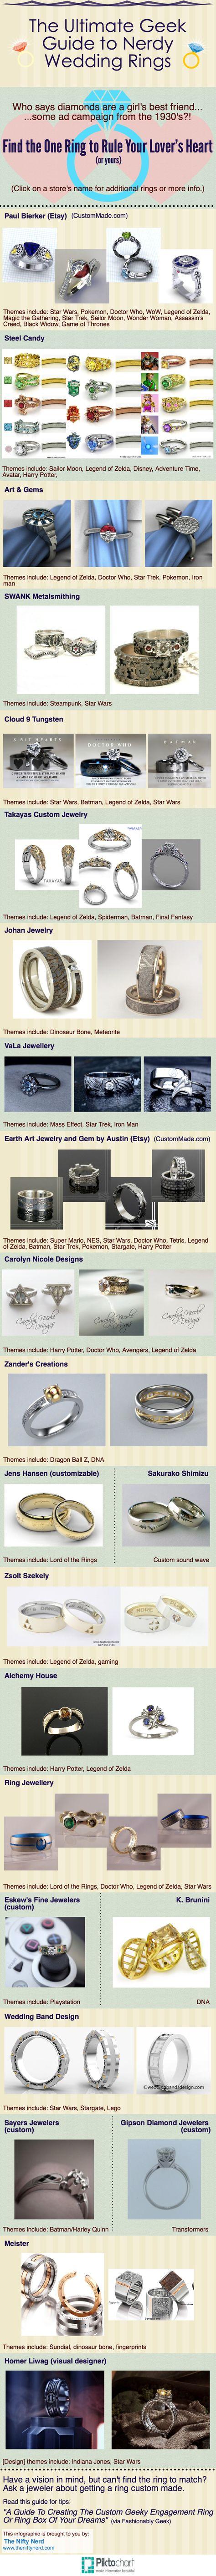 Best 25 Geek wedding rings ideas on Pinterest